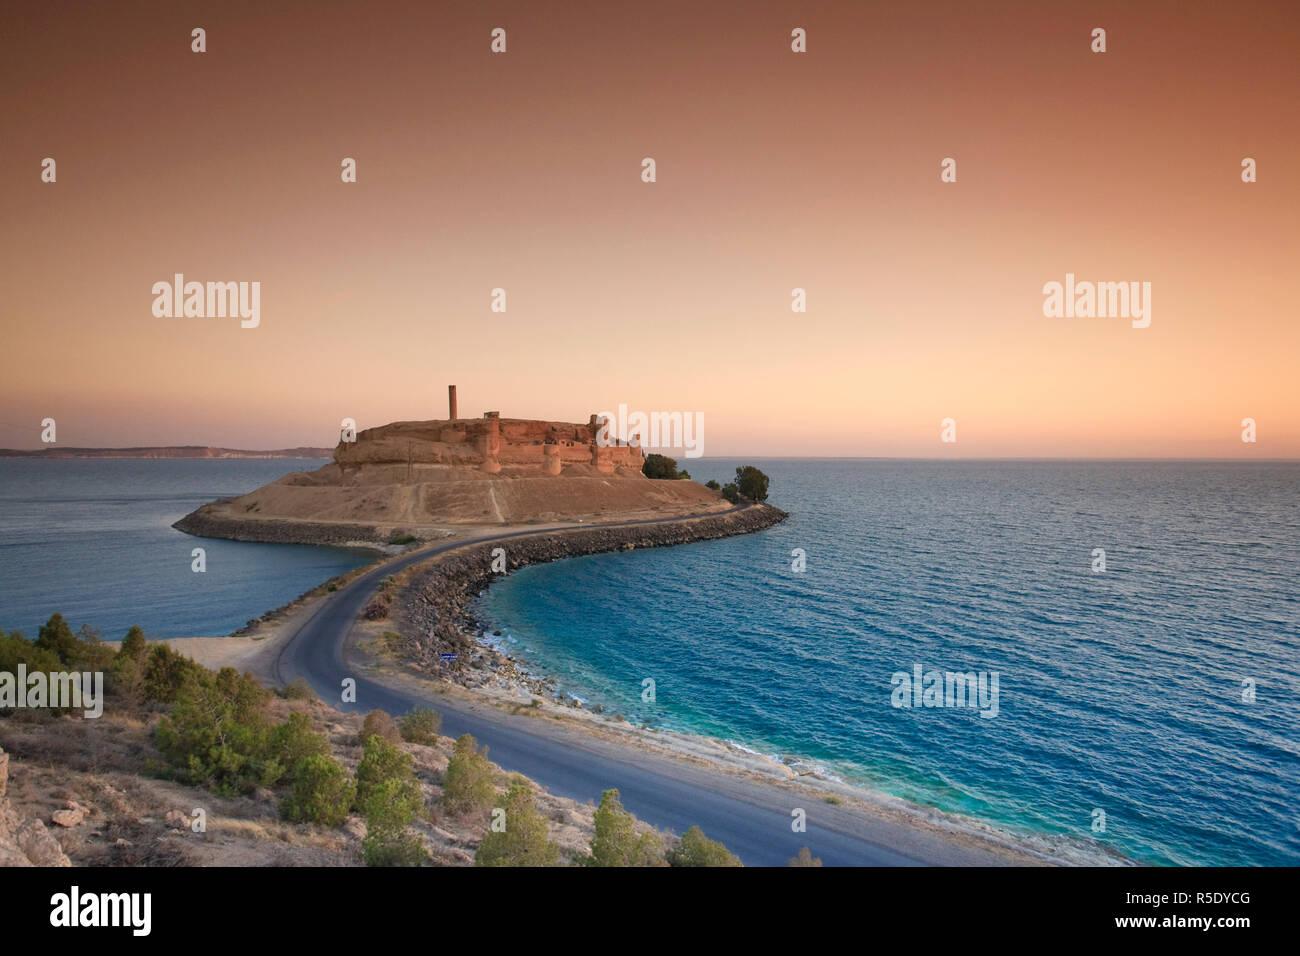 Syria, Euphrates river , Ath Thaura, Lake Al-Assad and Qalaat Jaabar Castle - Stock Image